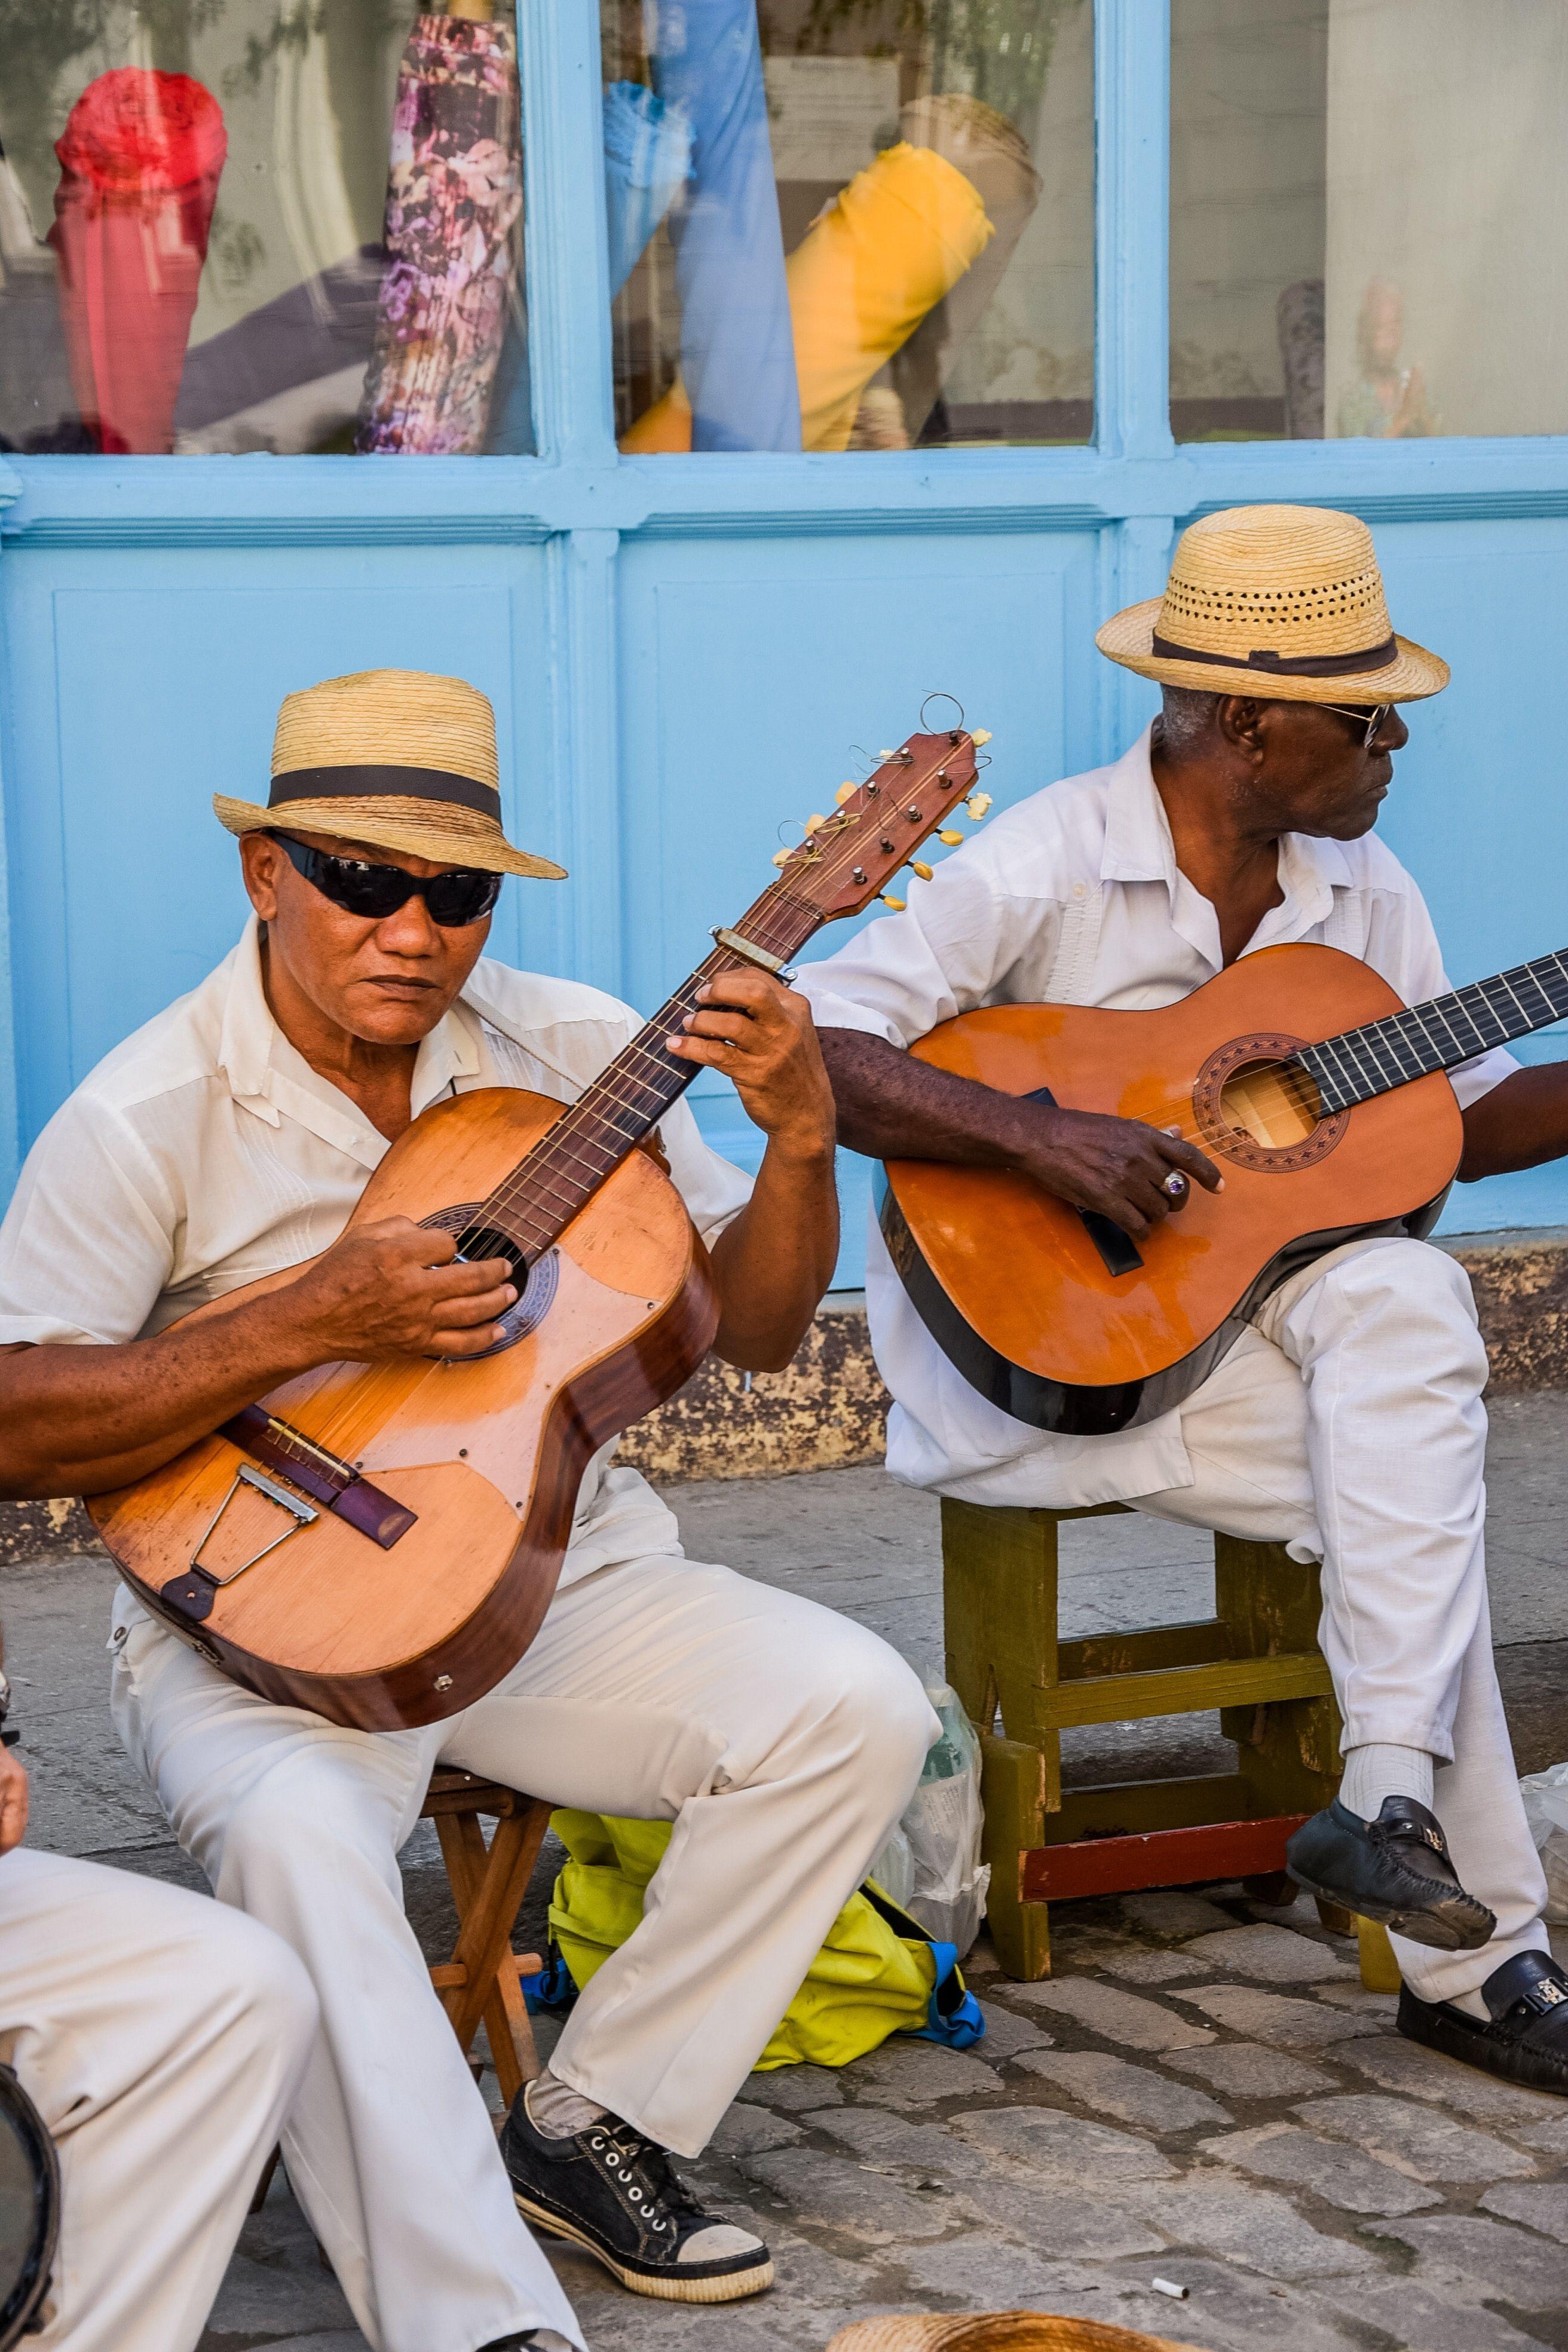 Old Havana, Havana, Cuba, Musica Cubana, NIKON CORPORATION, NIKON D750, #120D0B